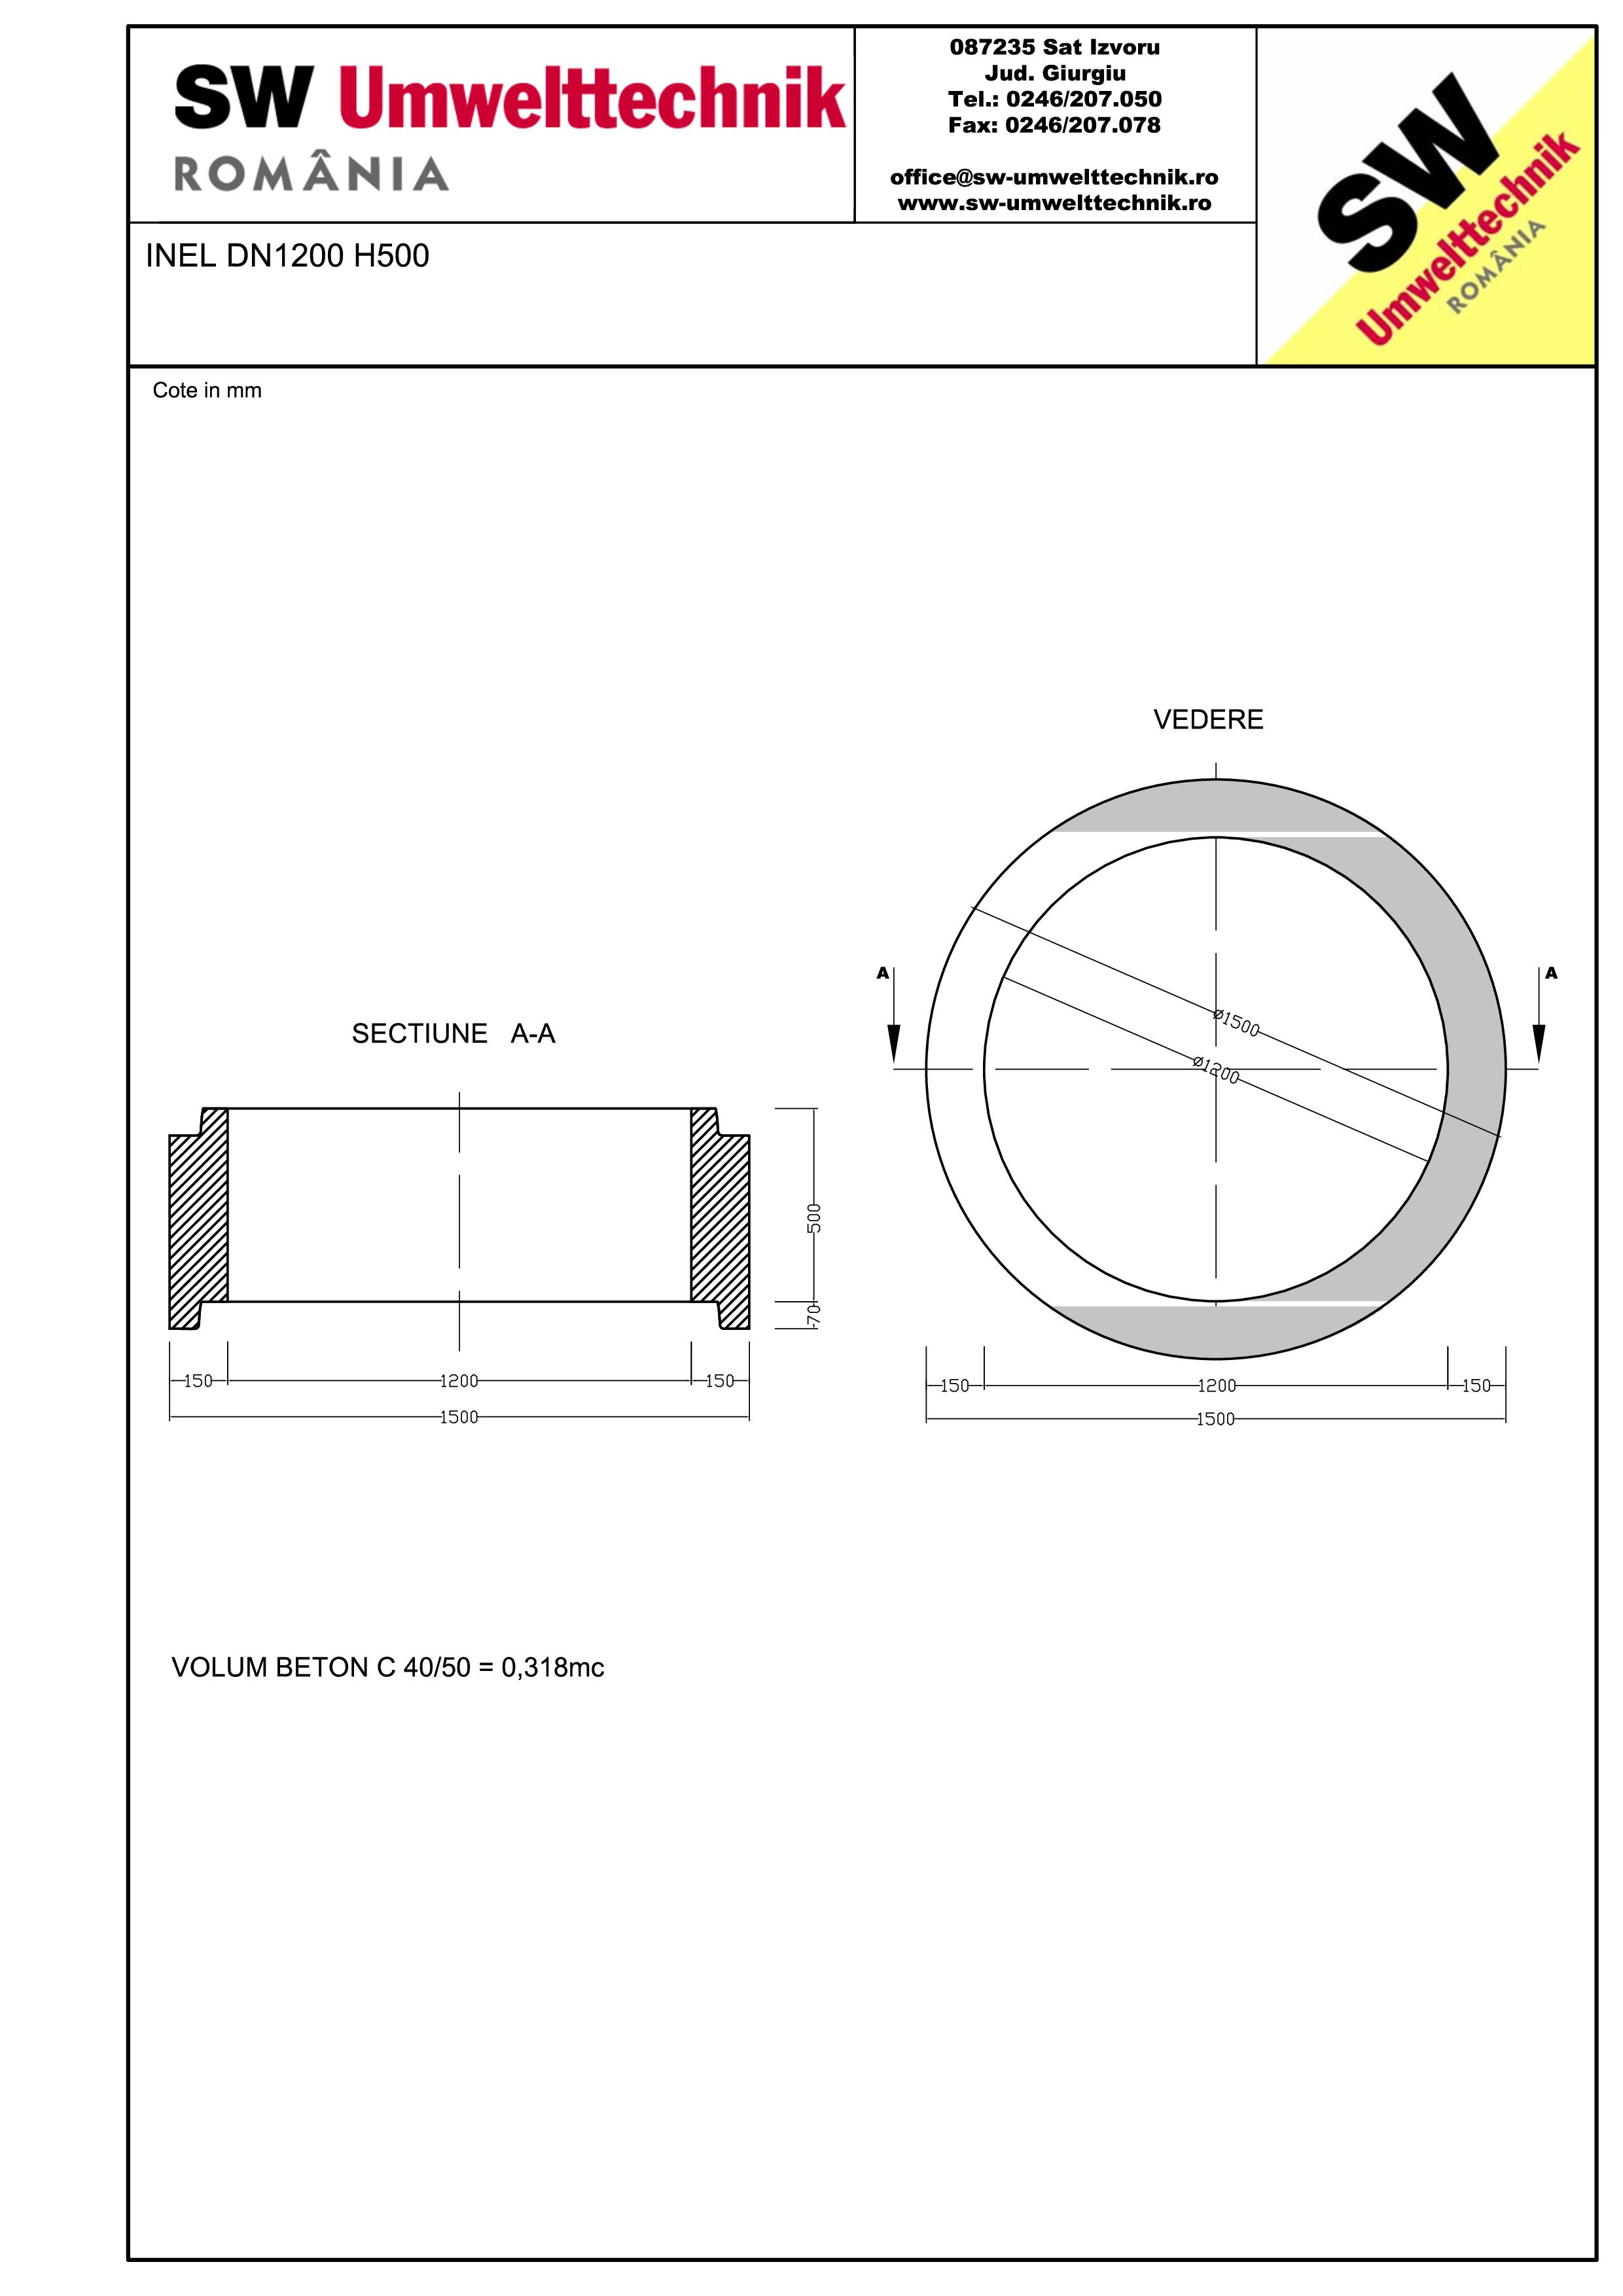 Pagina 1 - CAD-PDF Inel DN1200 INEL H500 SW UMWELTTECHNIK Detaliu de produs